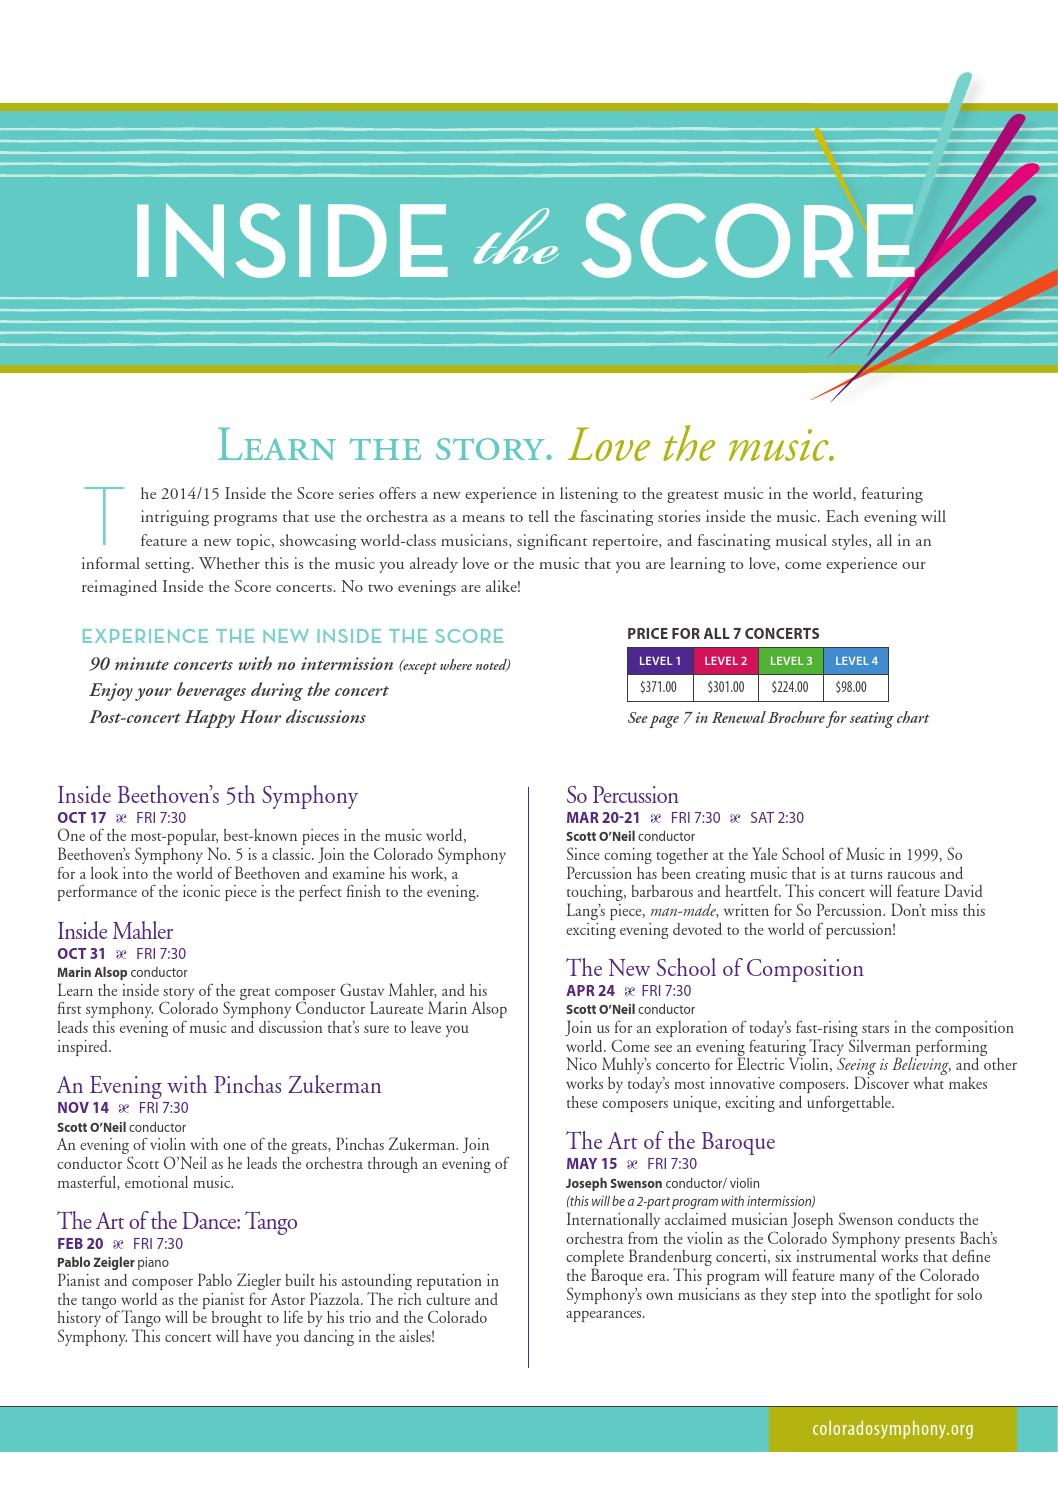 Colorado Symphony 14/15 Inside the Score by Colorado Symphony - issuu